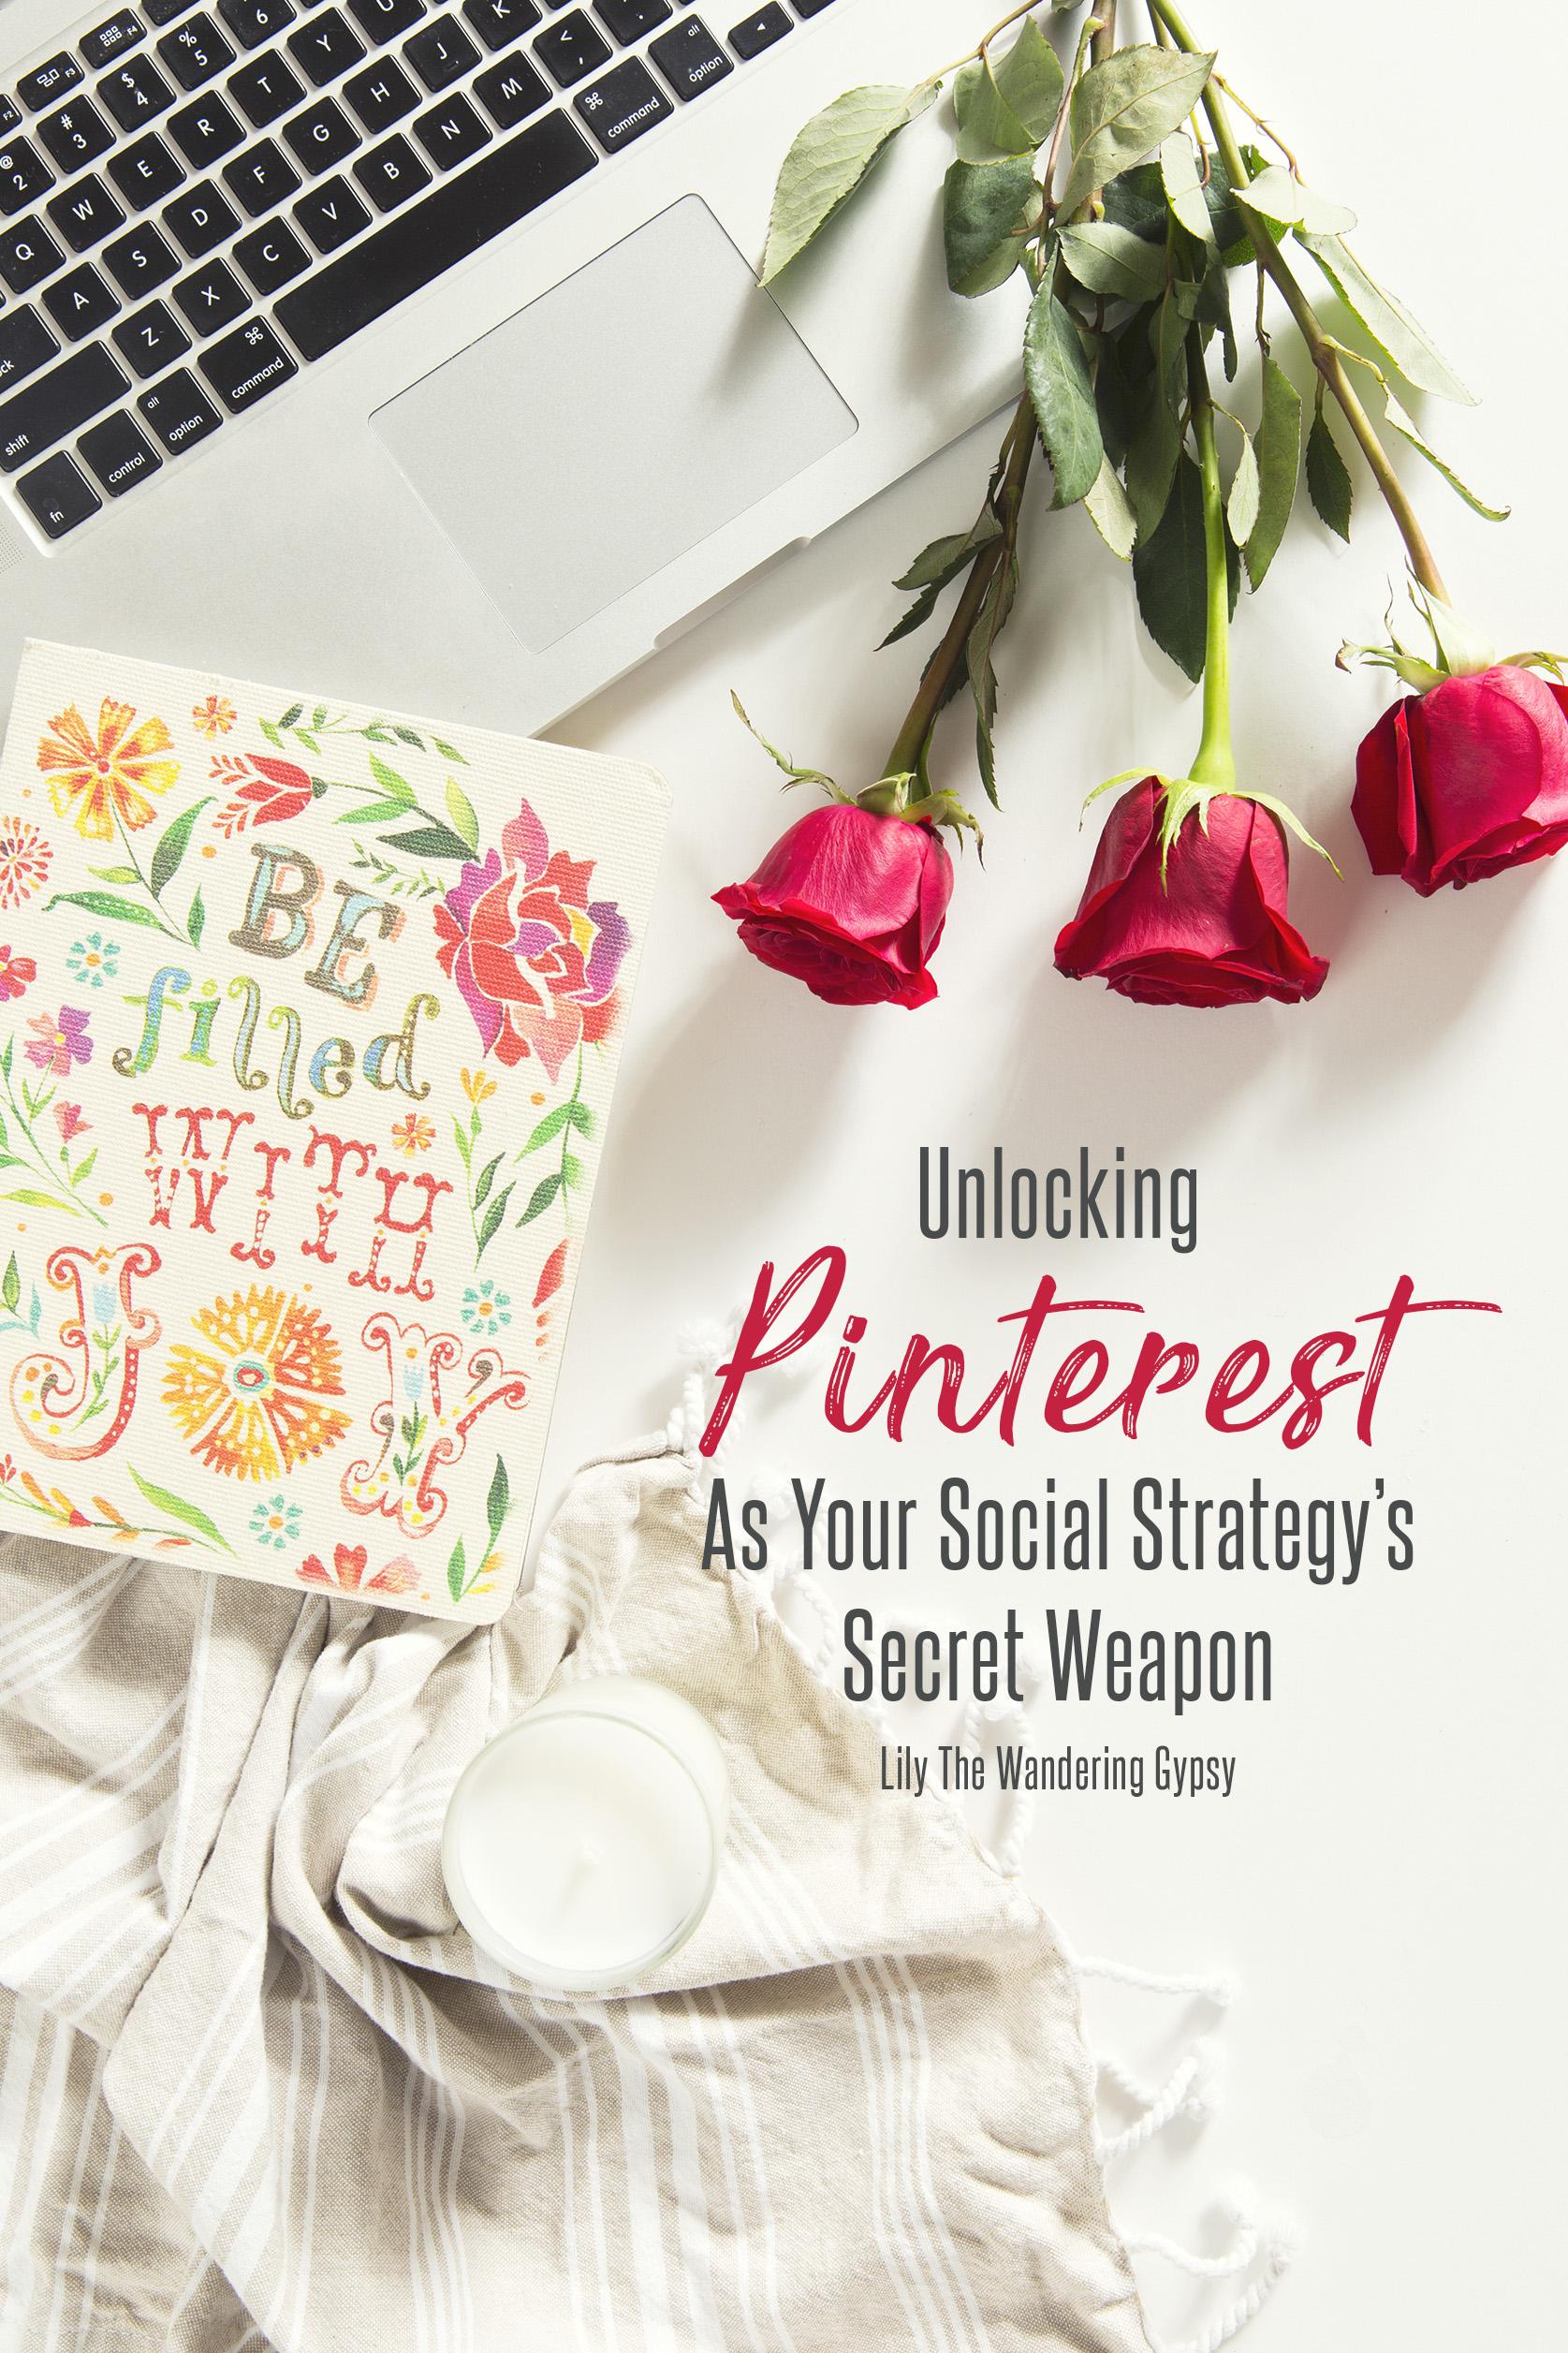 Unlocking Pinterest As Your Social Strategy's Secret Weapon